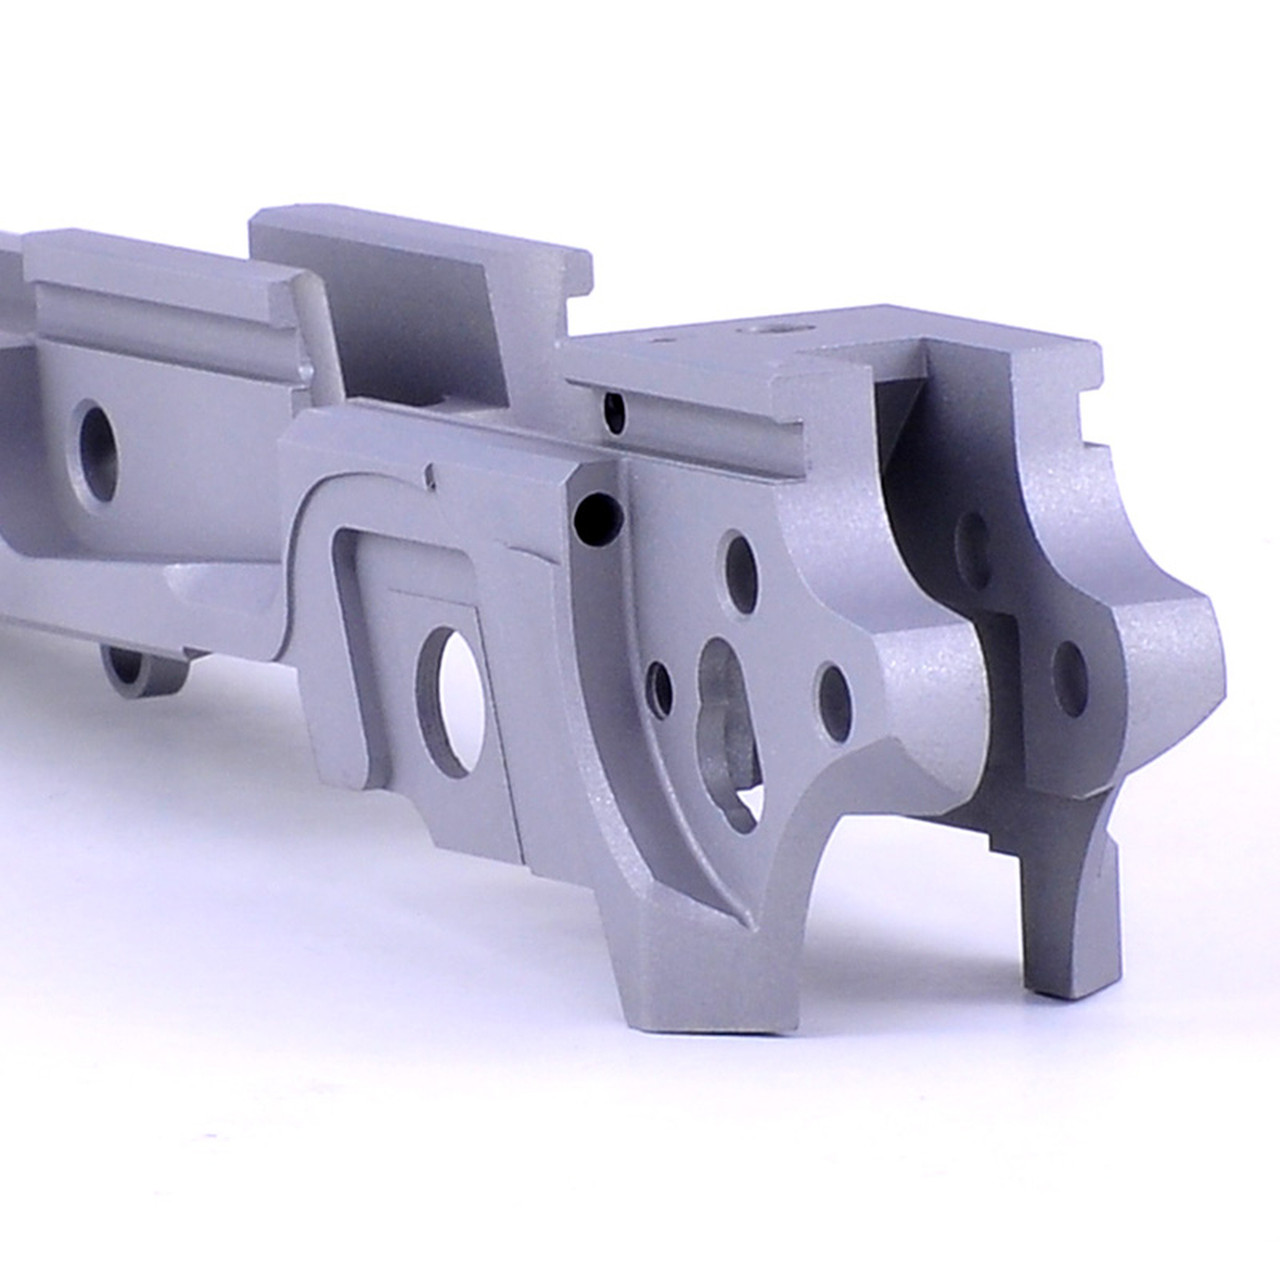 Cheely Custom Gunworks XWF Serialized Frame - Heavy (Clark Para) (Restricted Firearm)